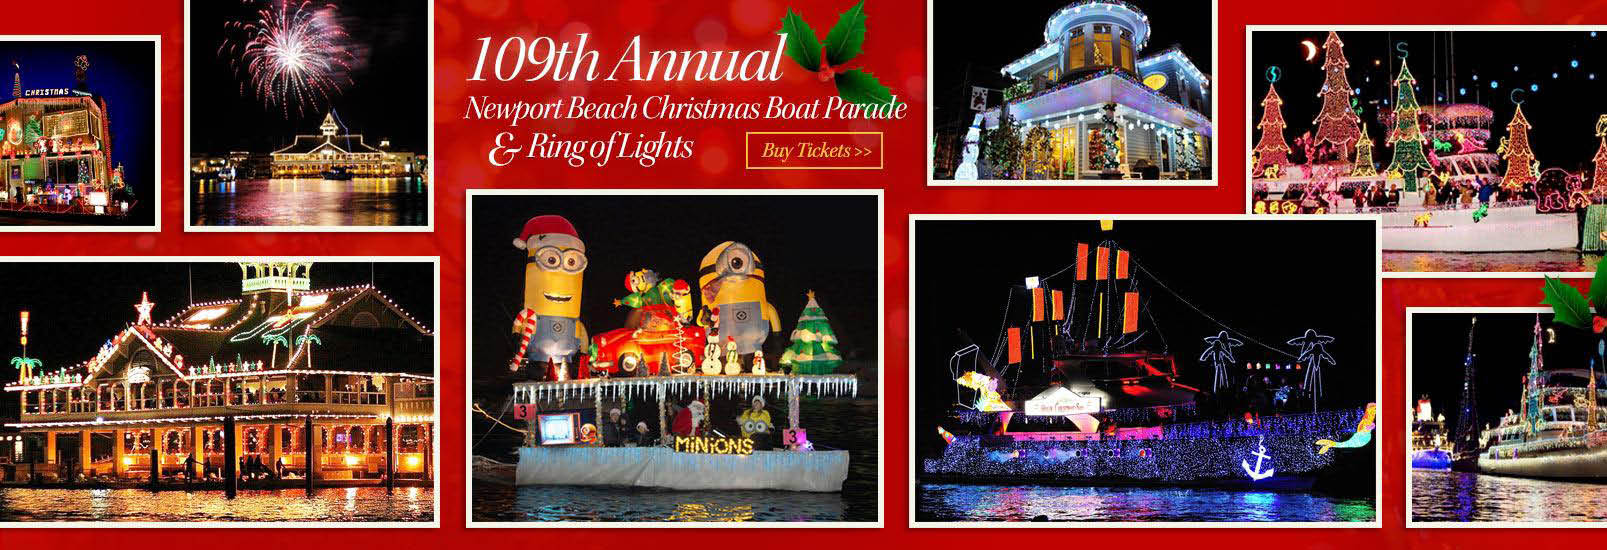 Newport Landing Christmas Boat Parade and Holiday Cruise Newport Beach, CA